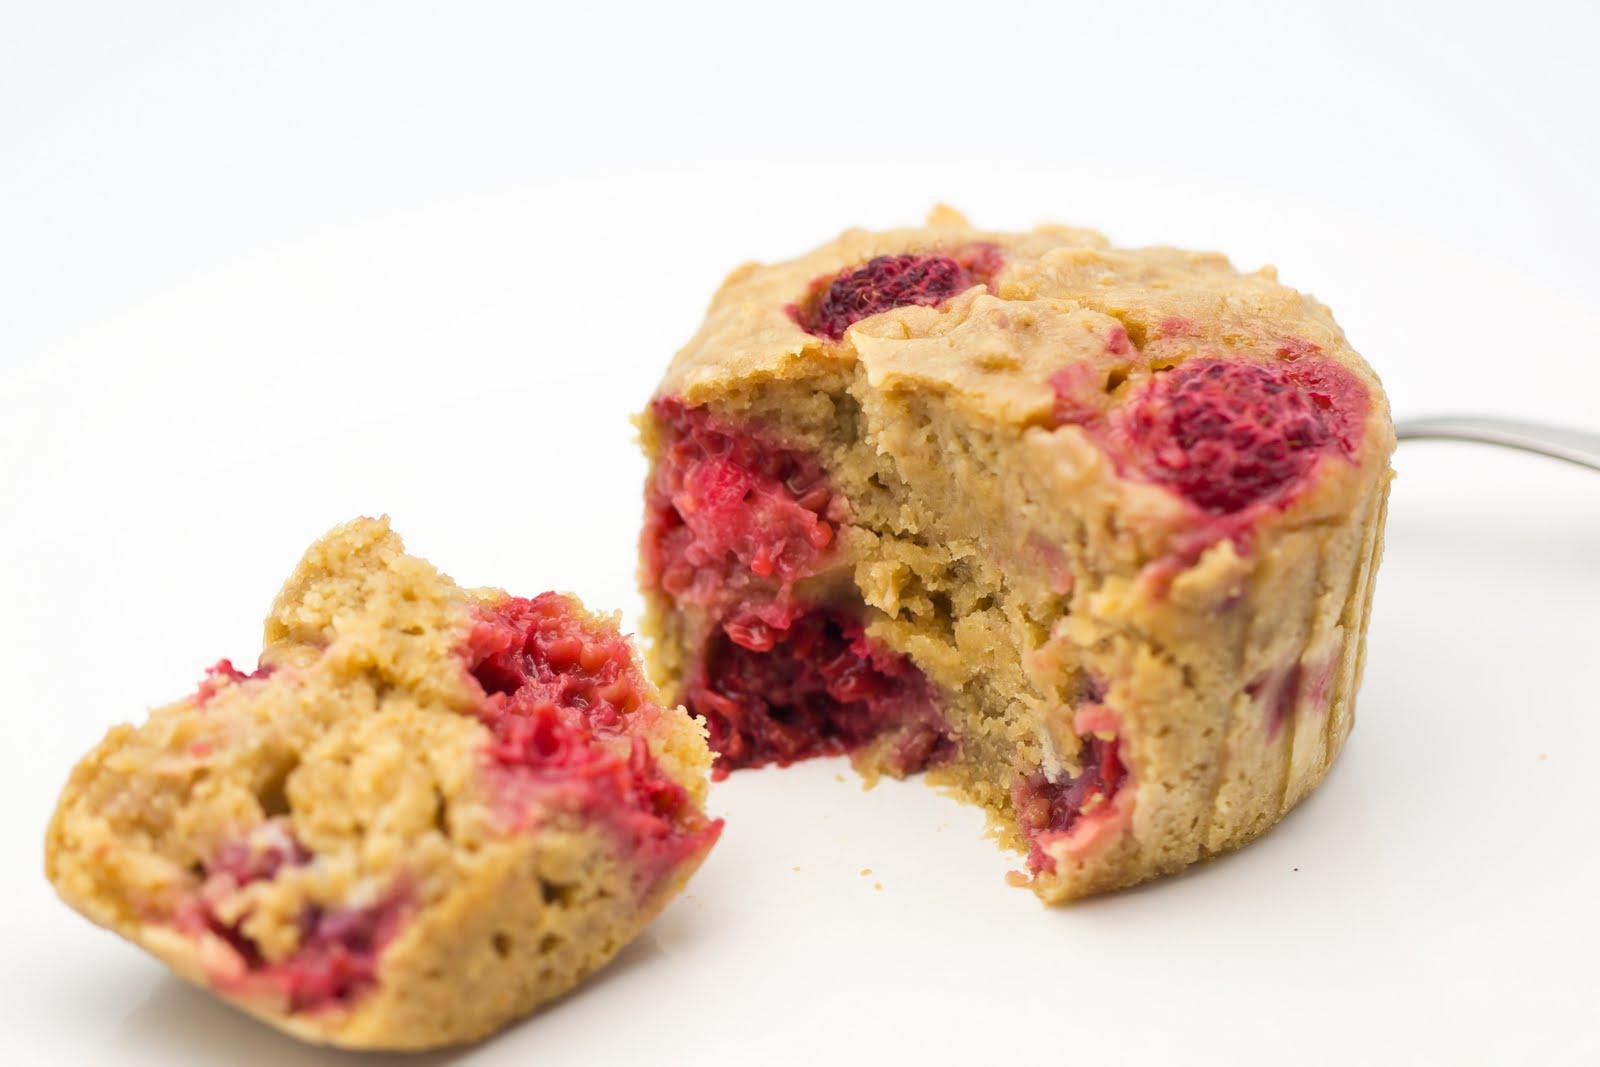 Hovkonditorn: Hallonmuffins / Raspberry Muffin